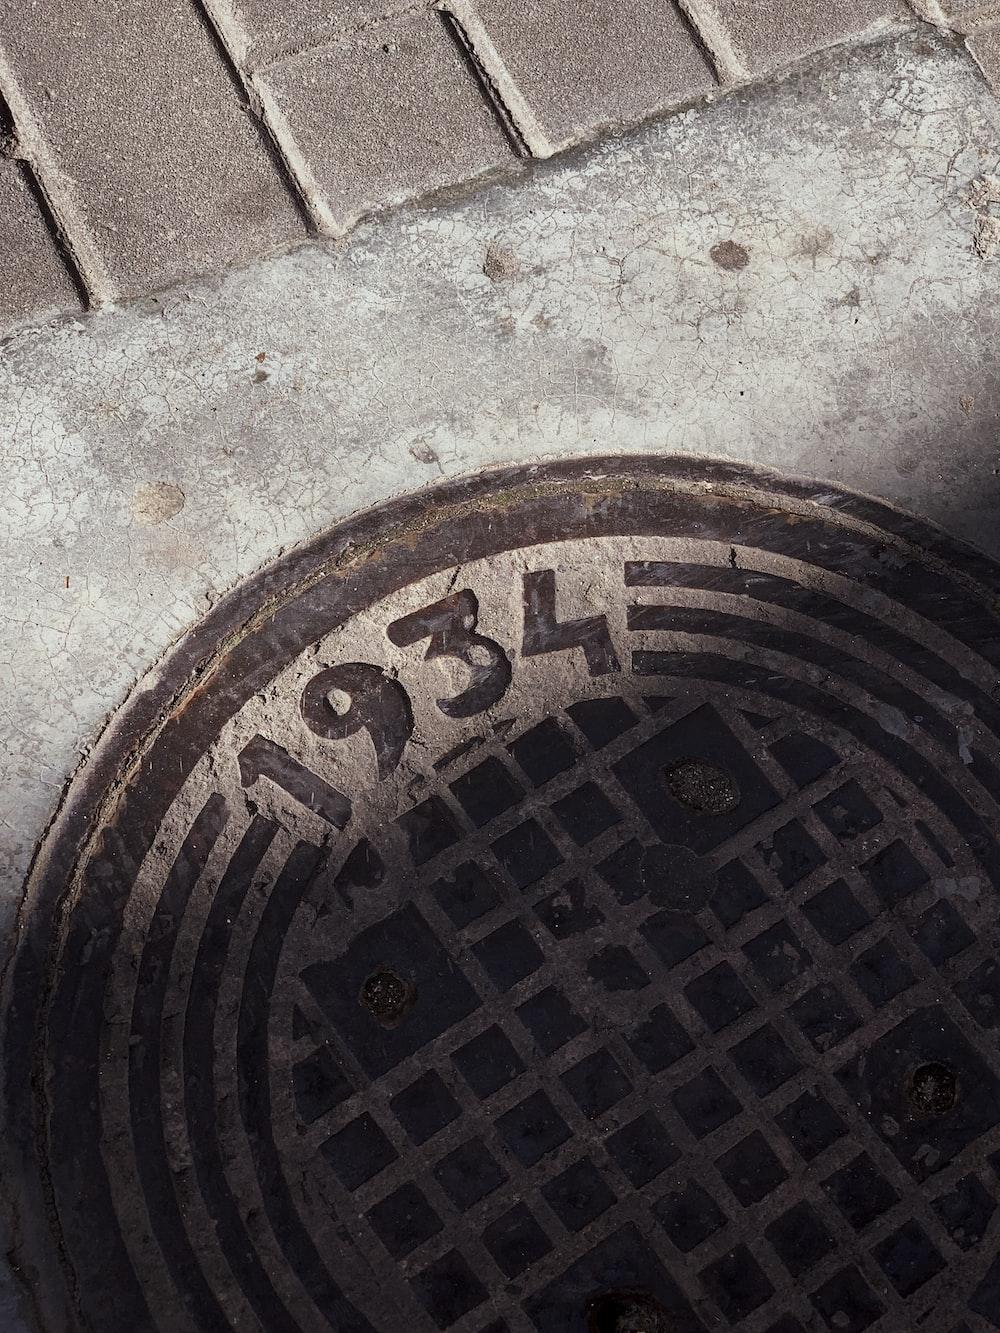 1934 manhole cover on floor